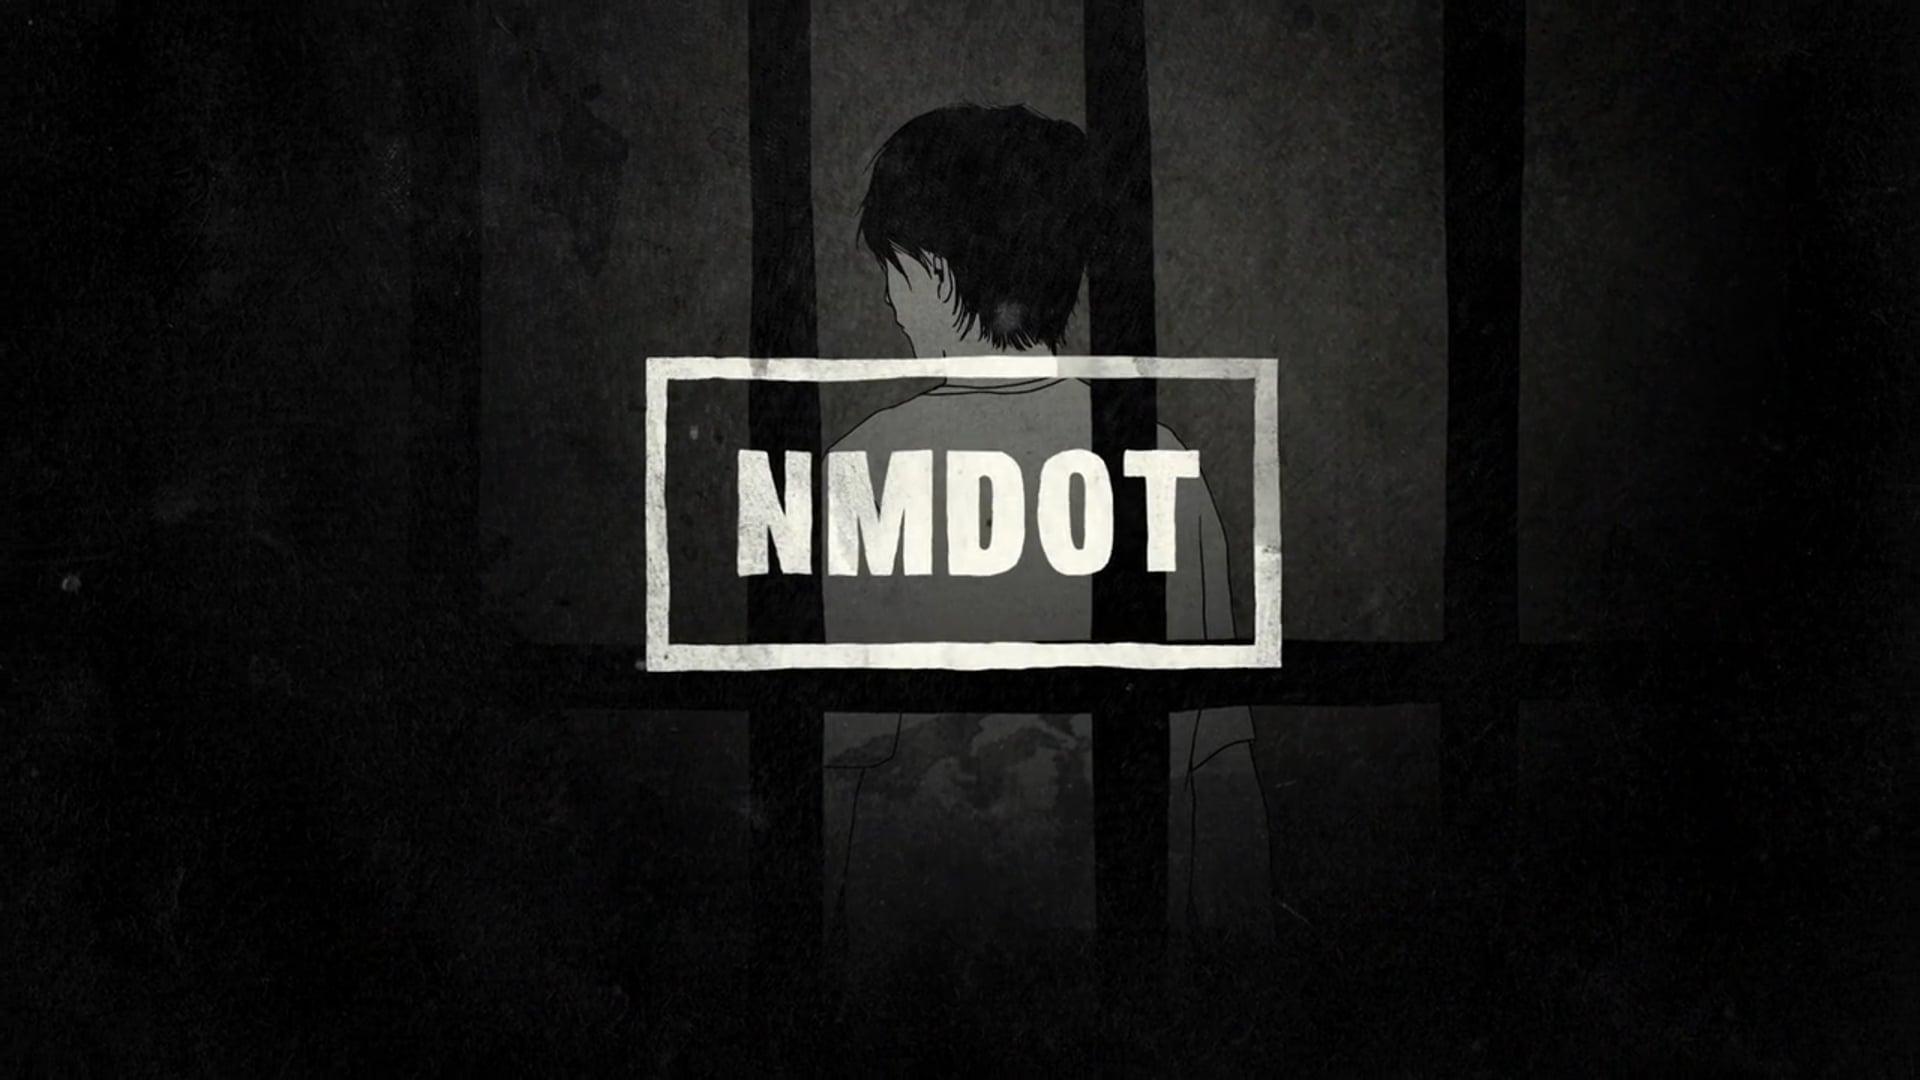 NMDOT Underage Drinking.  Agency: VWK